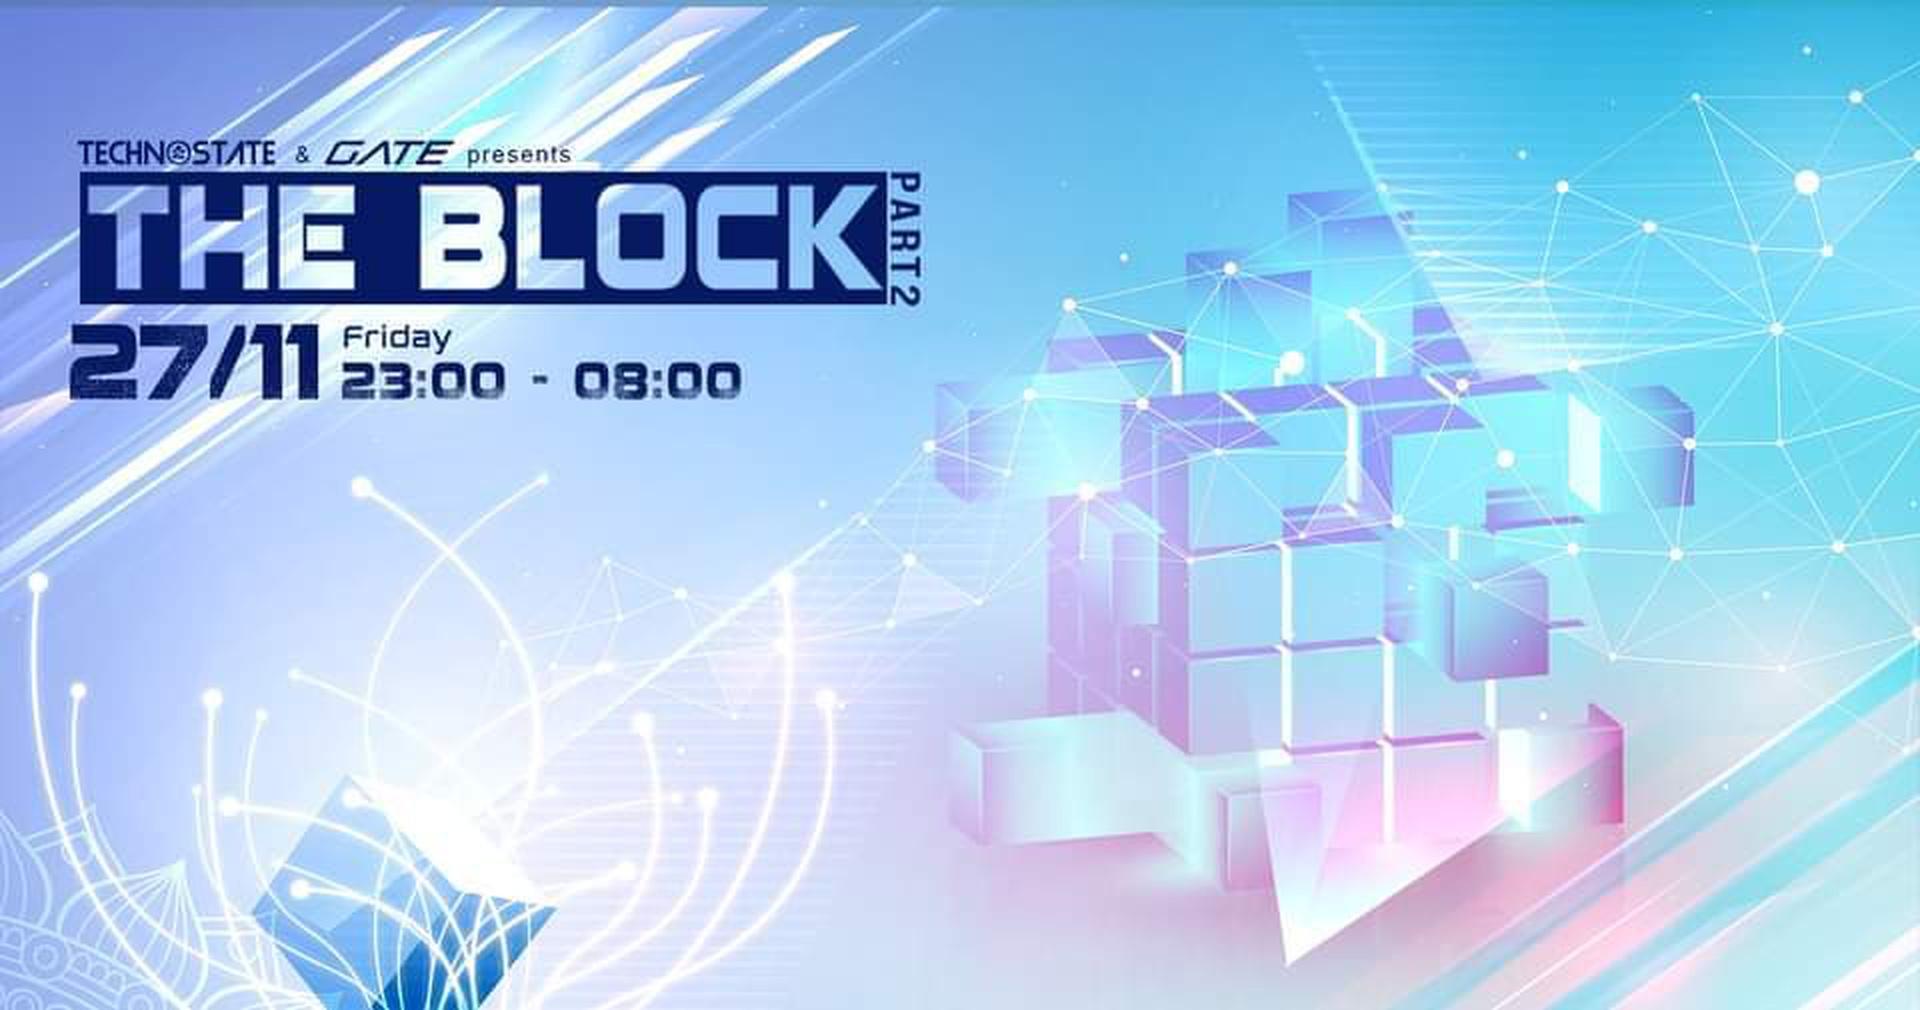 Event: THE BLOCK #2 - Technostate & Gate